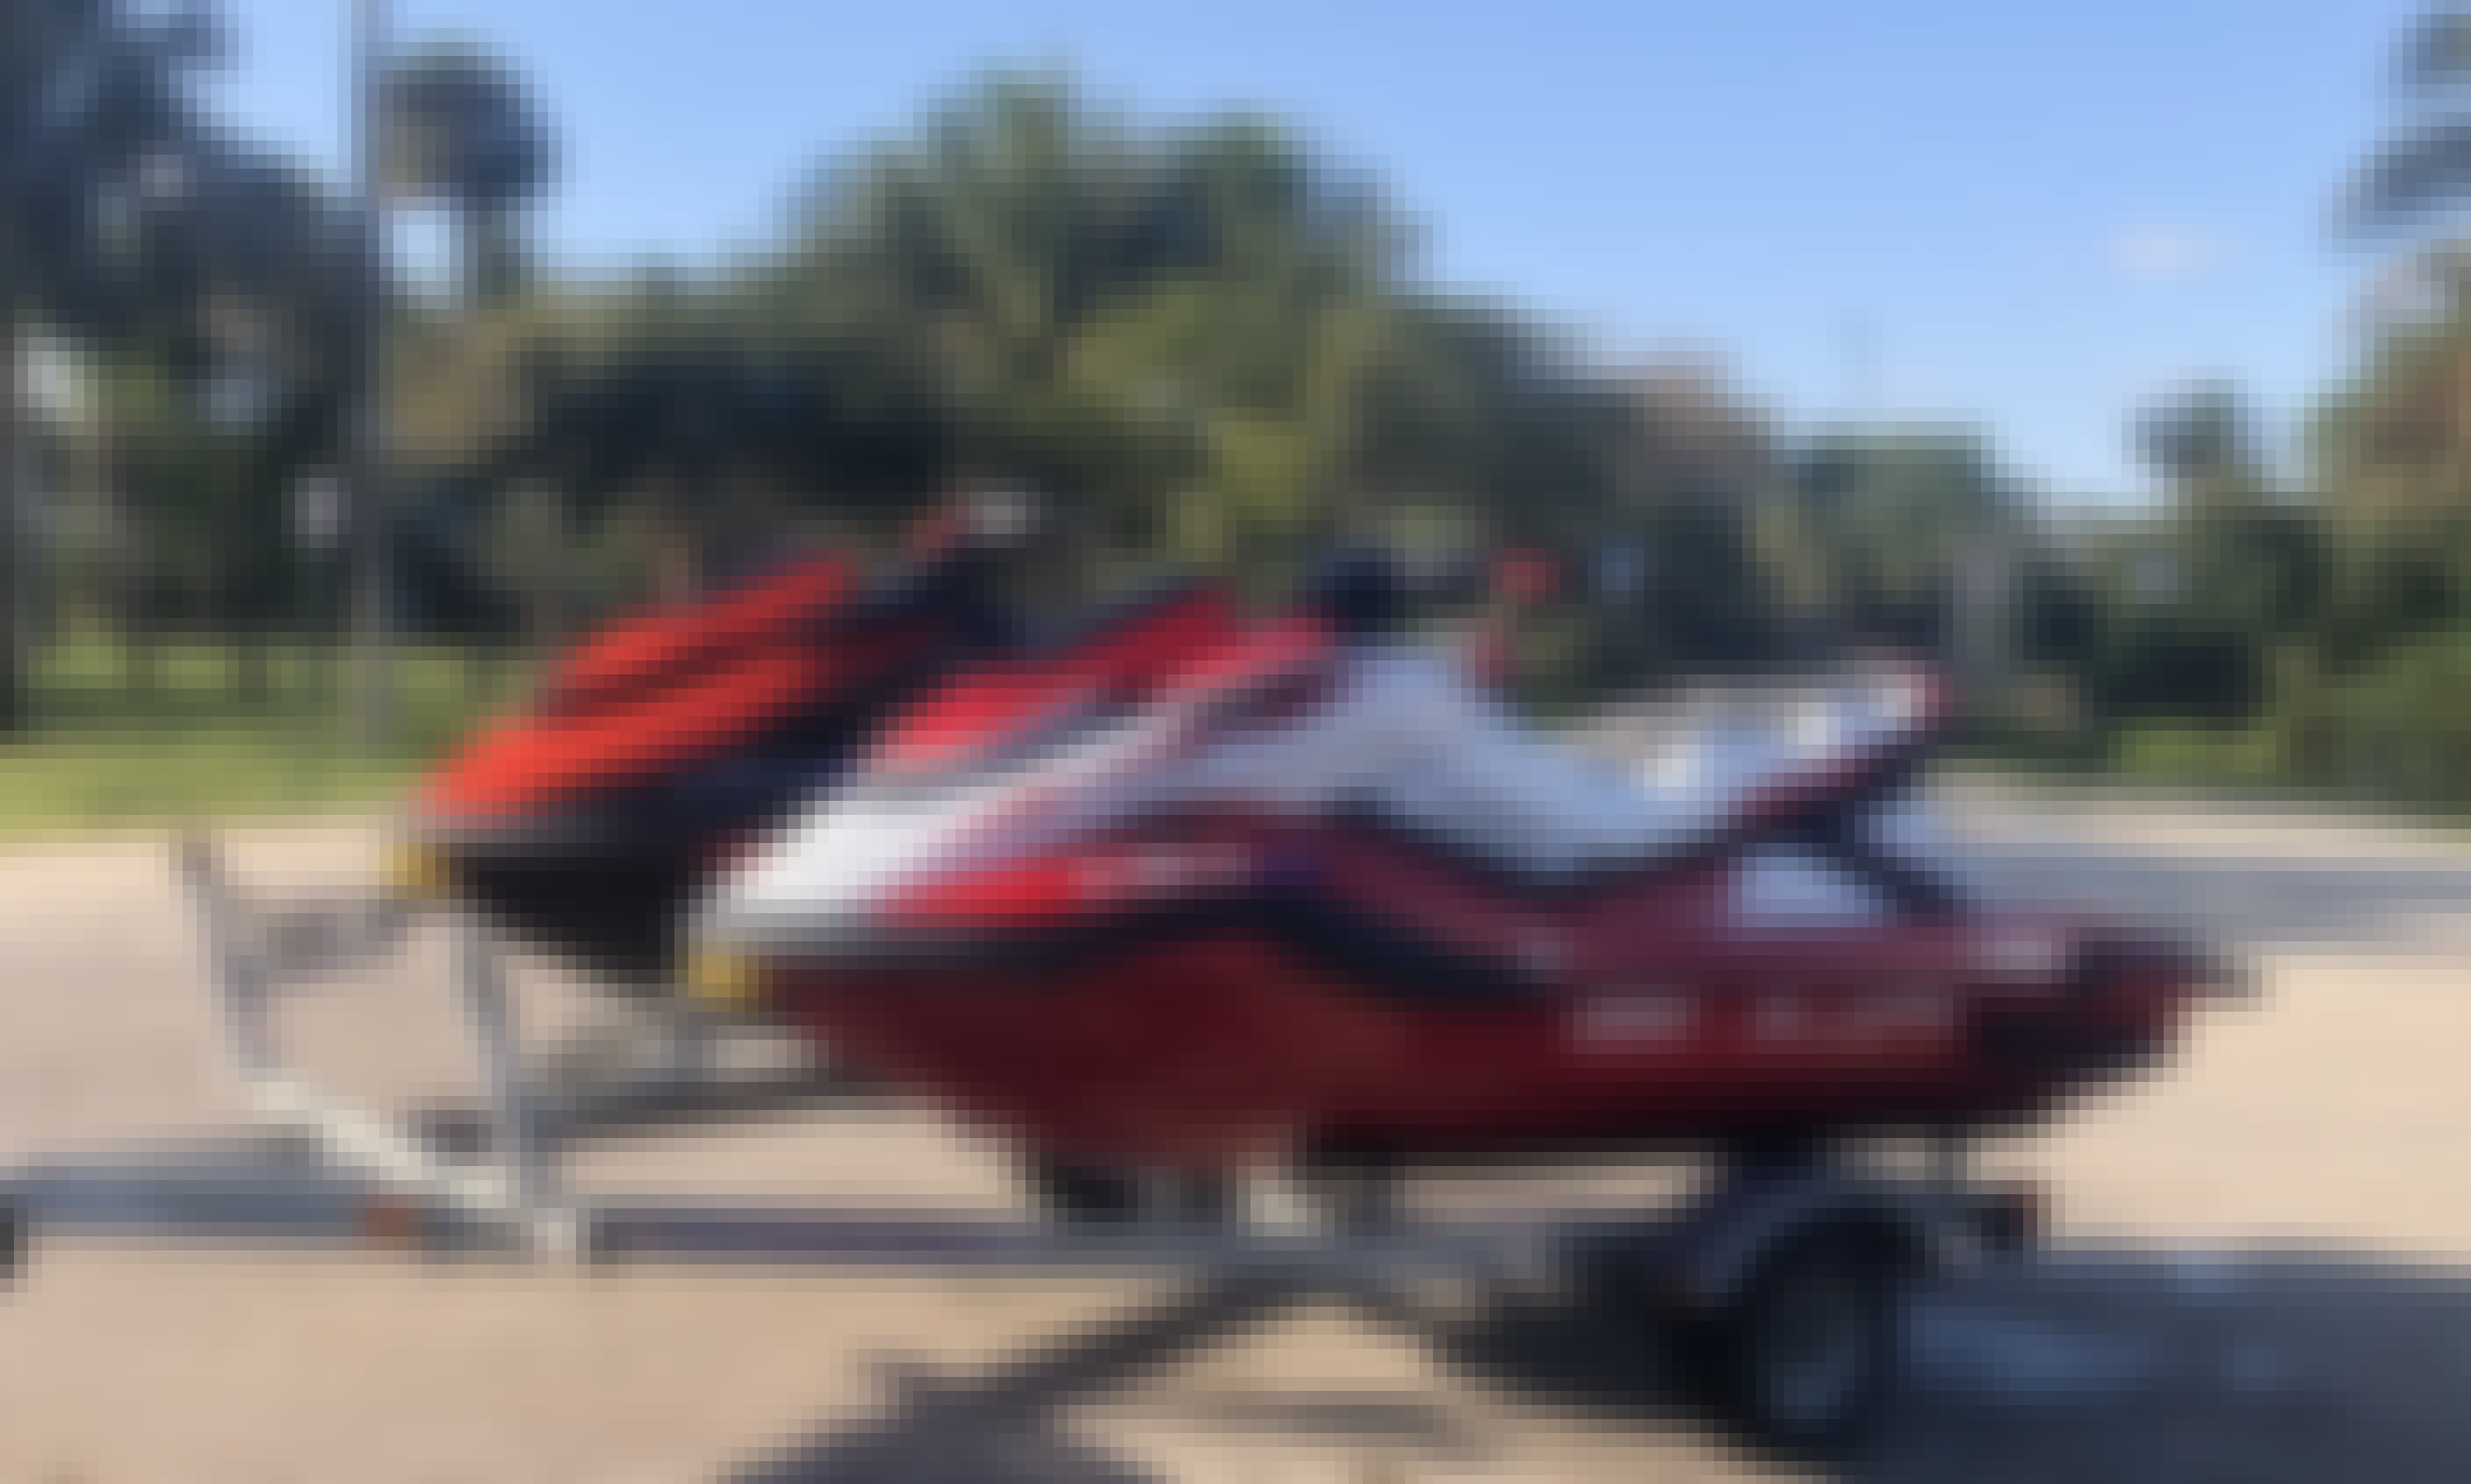 2021 Yamaha SVHO FX Cruiser!  Ocean Adventure at it's Finest!!